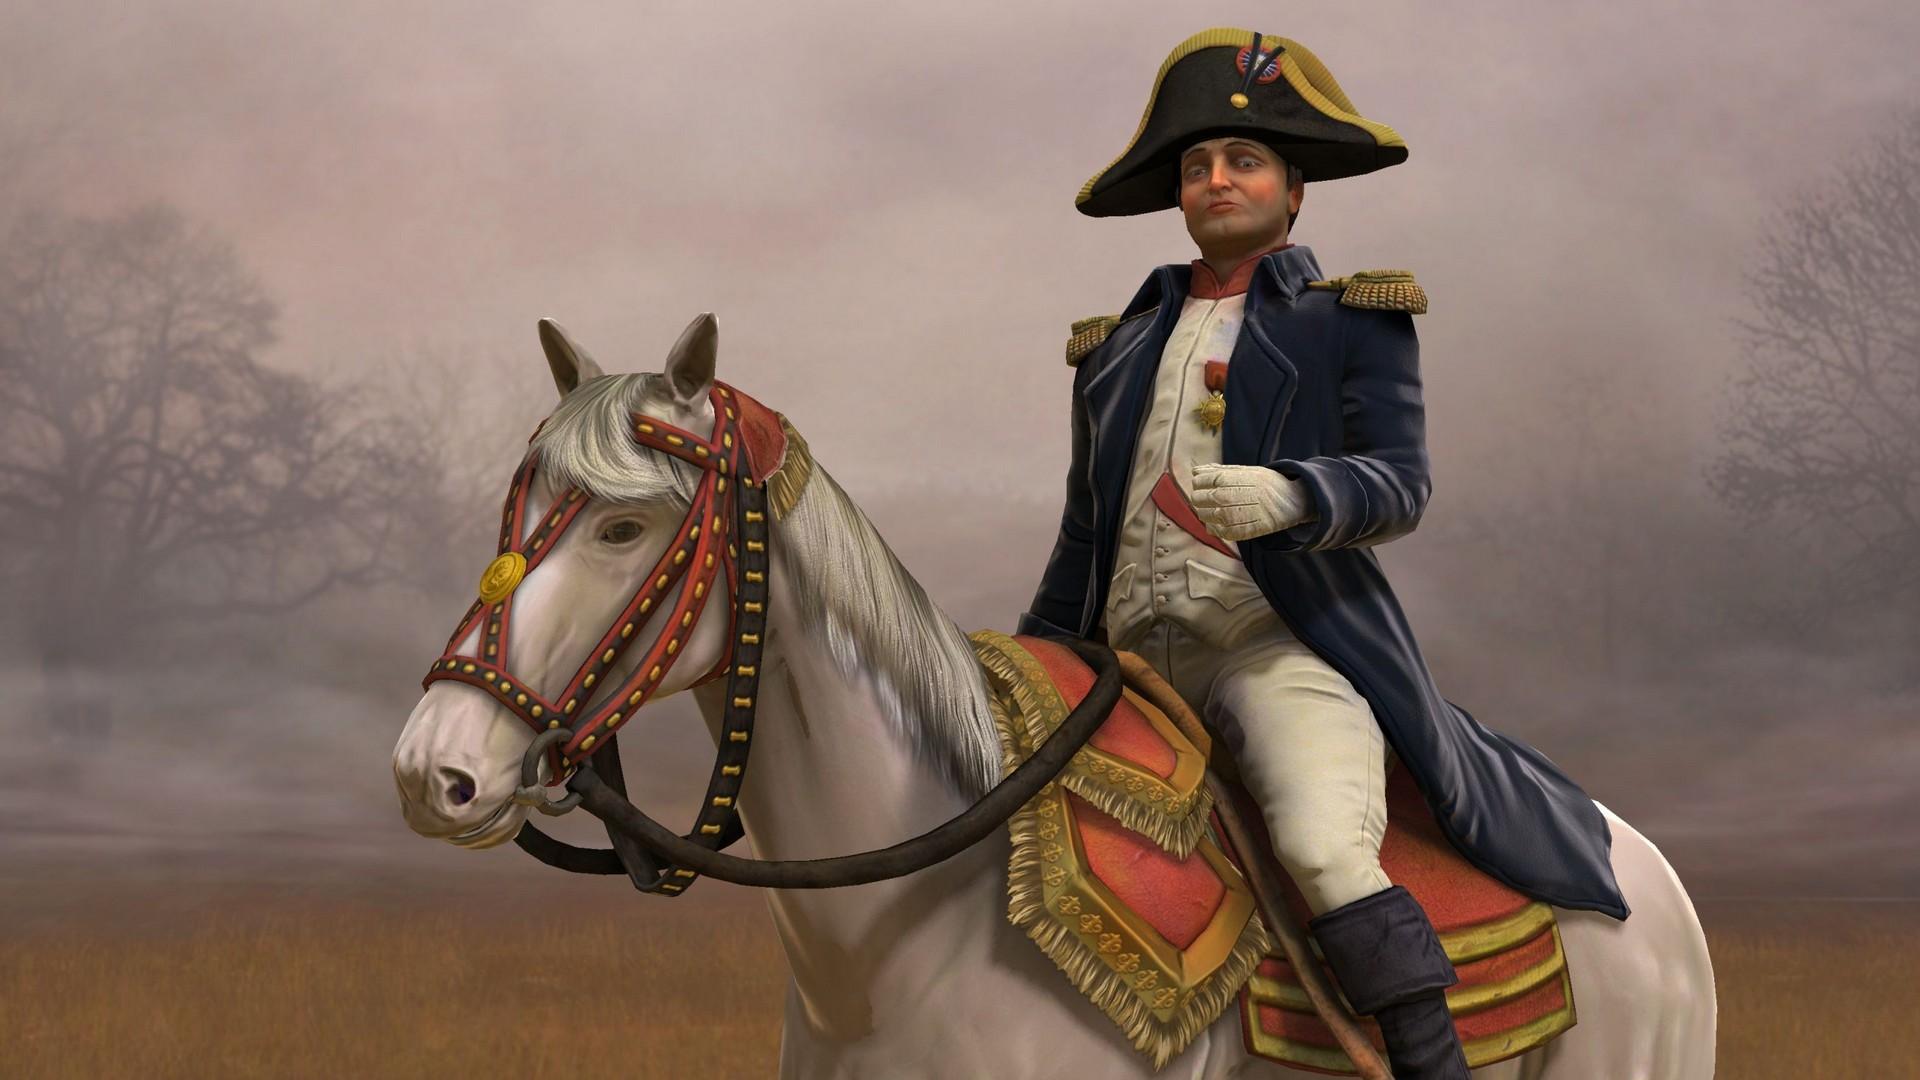 Civilization 5, Napoleon On His Horse Marengo 1920x1080 HD